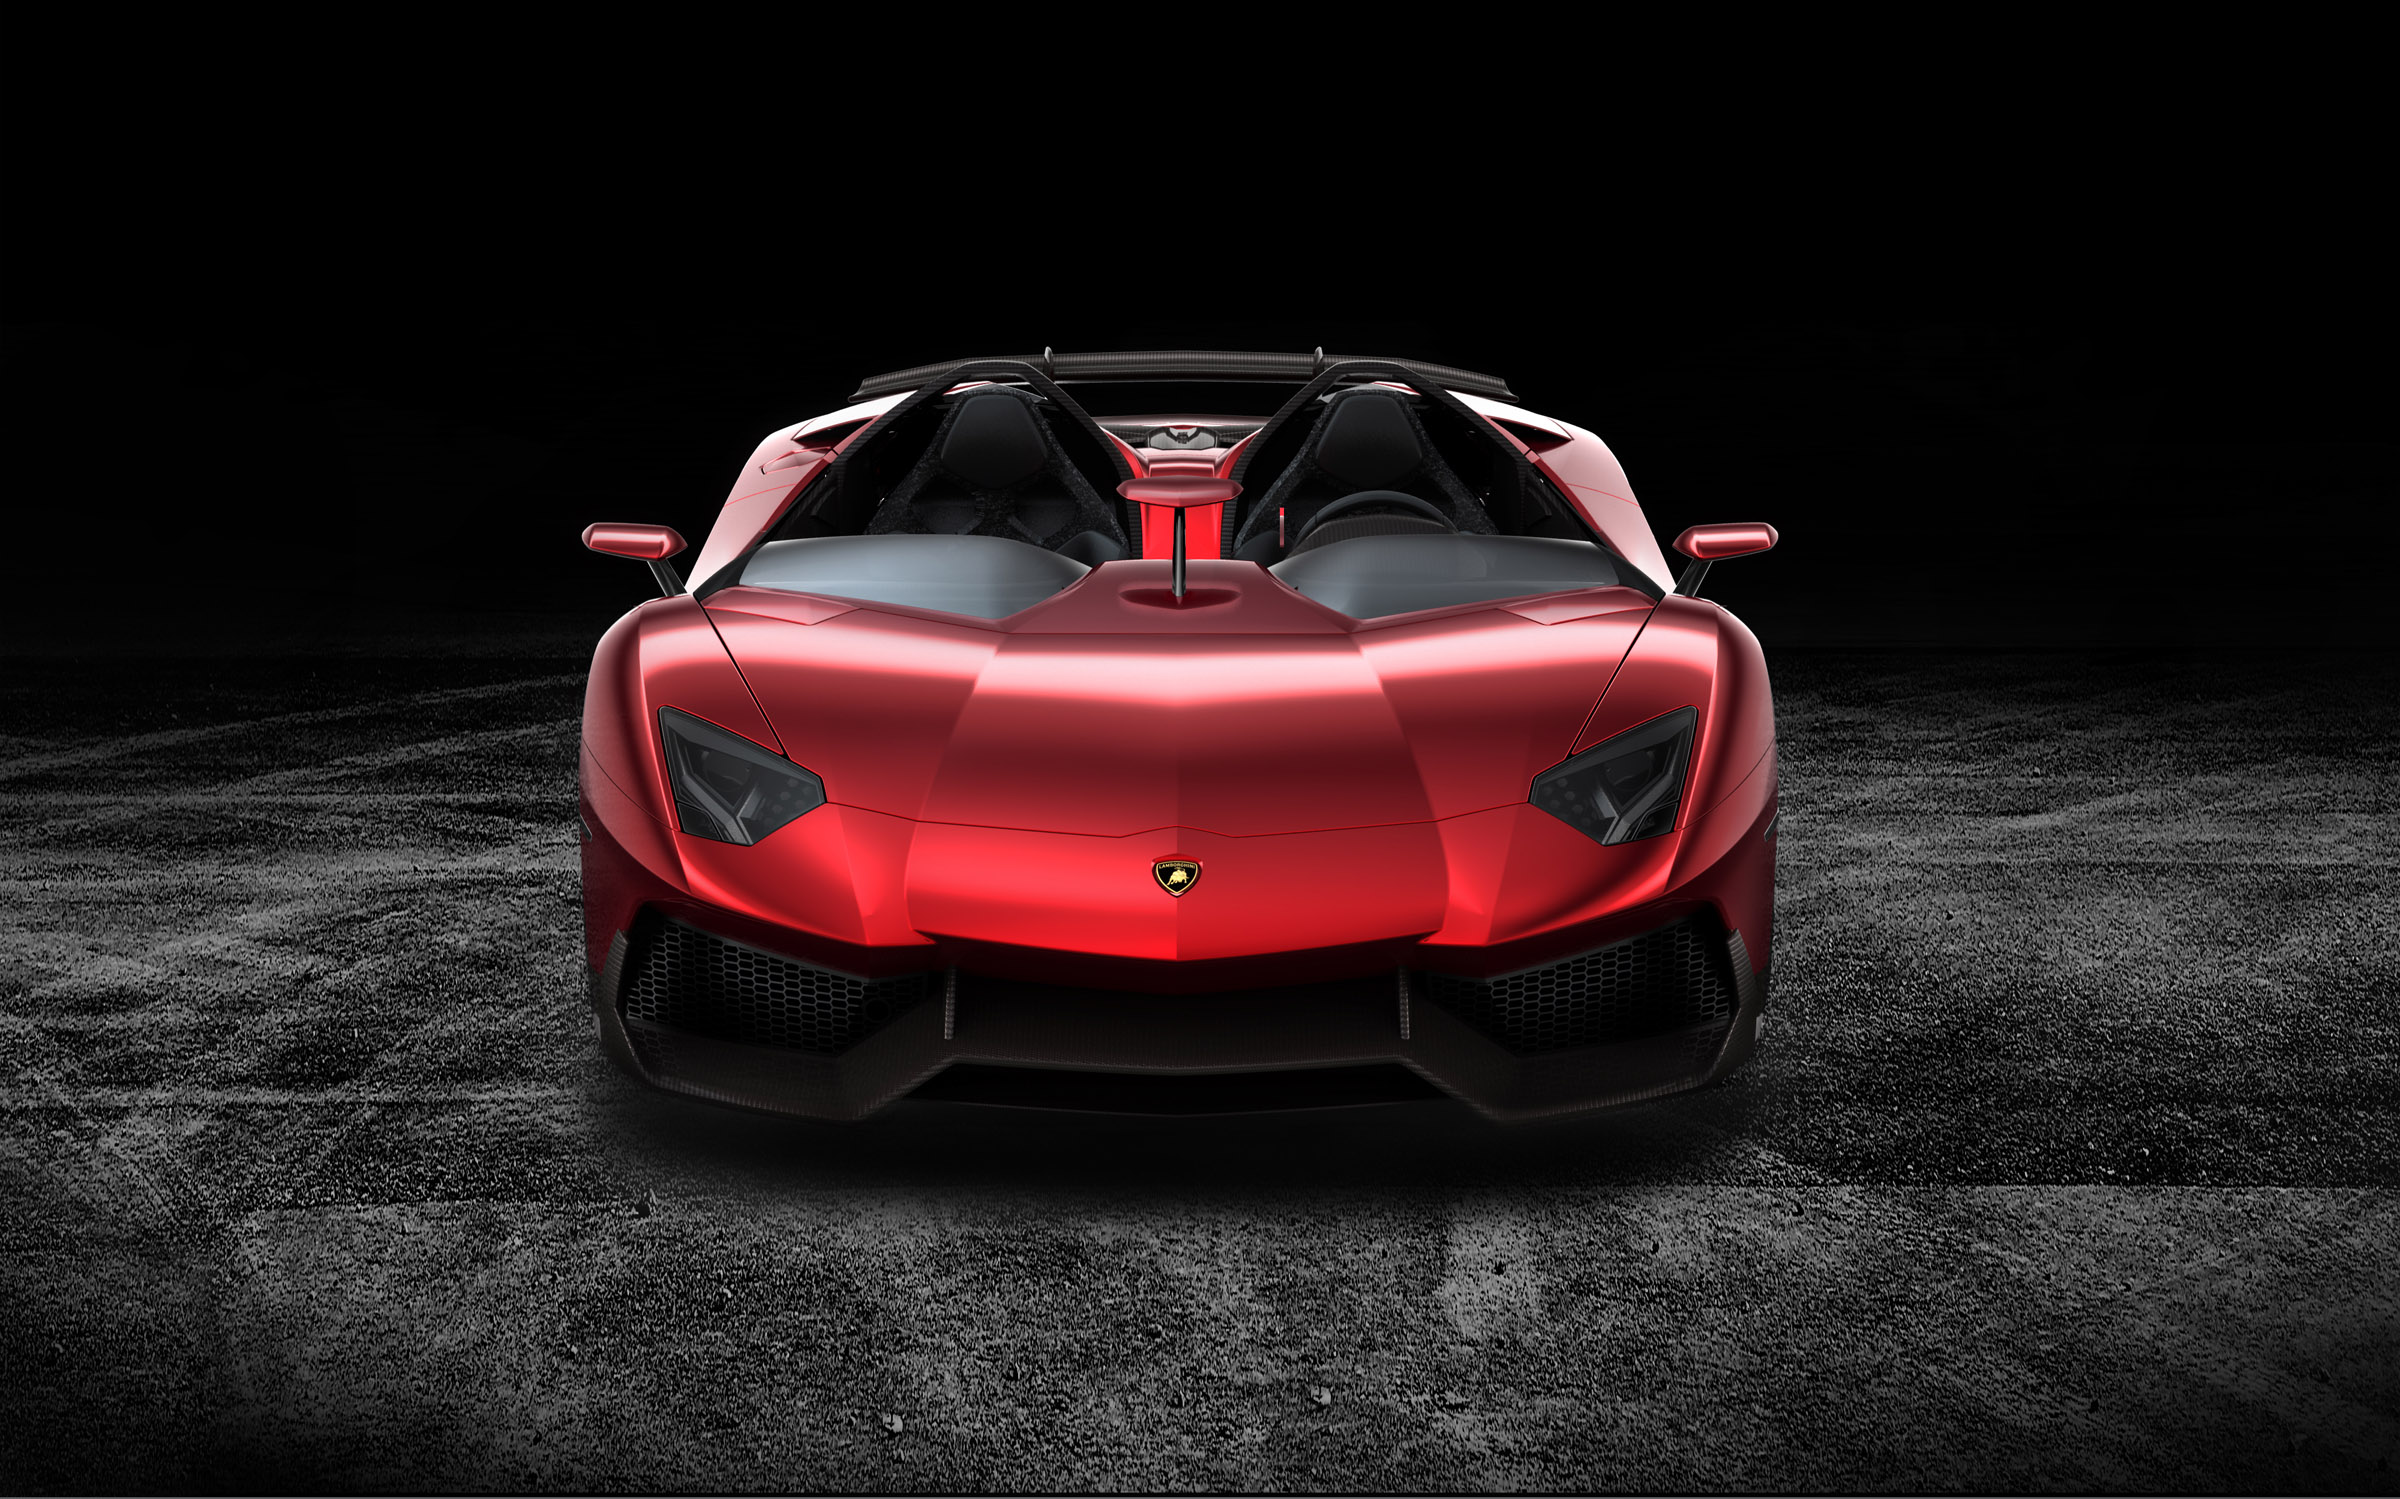 Lamborghini Aventador J Выявлено - фотография №8